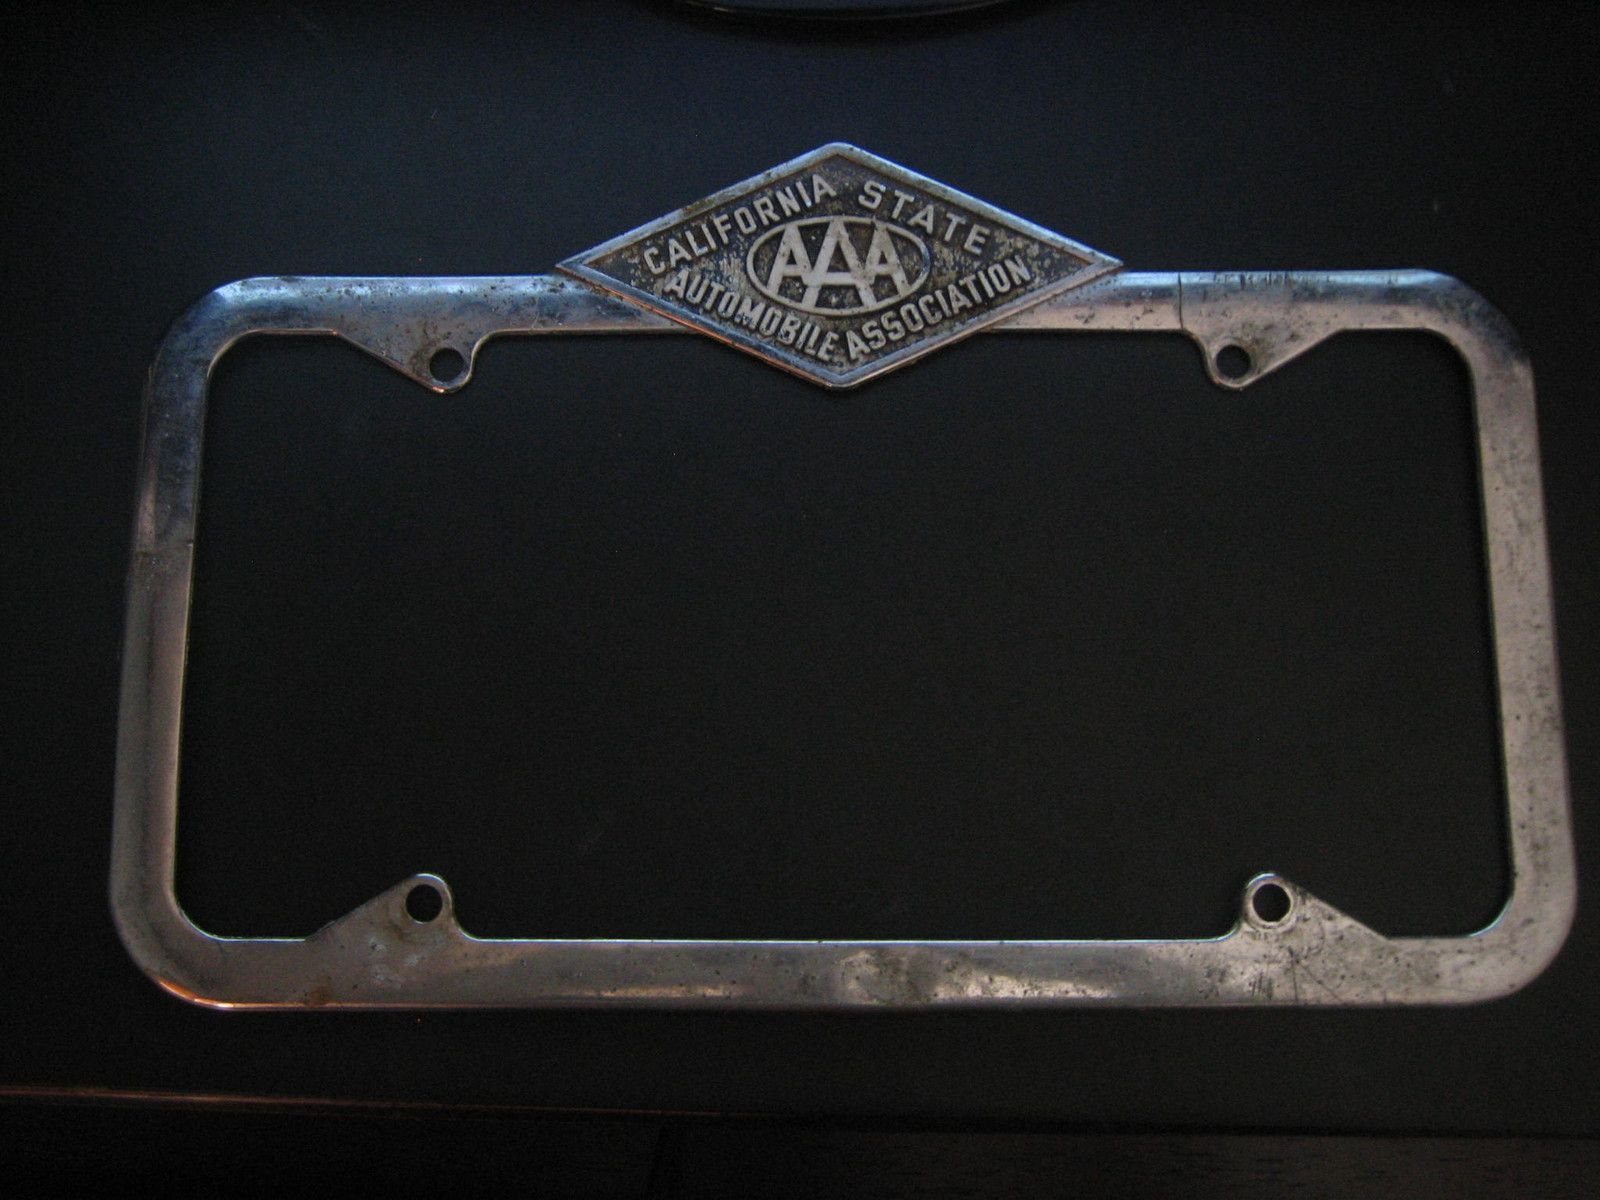 California State Automobile Association AAA Vintage Dealer License ...